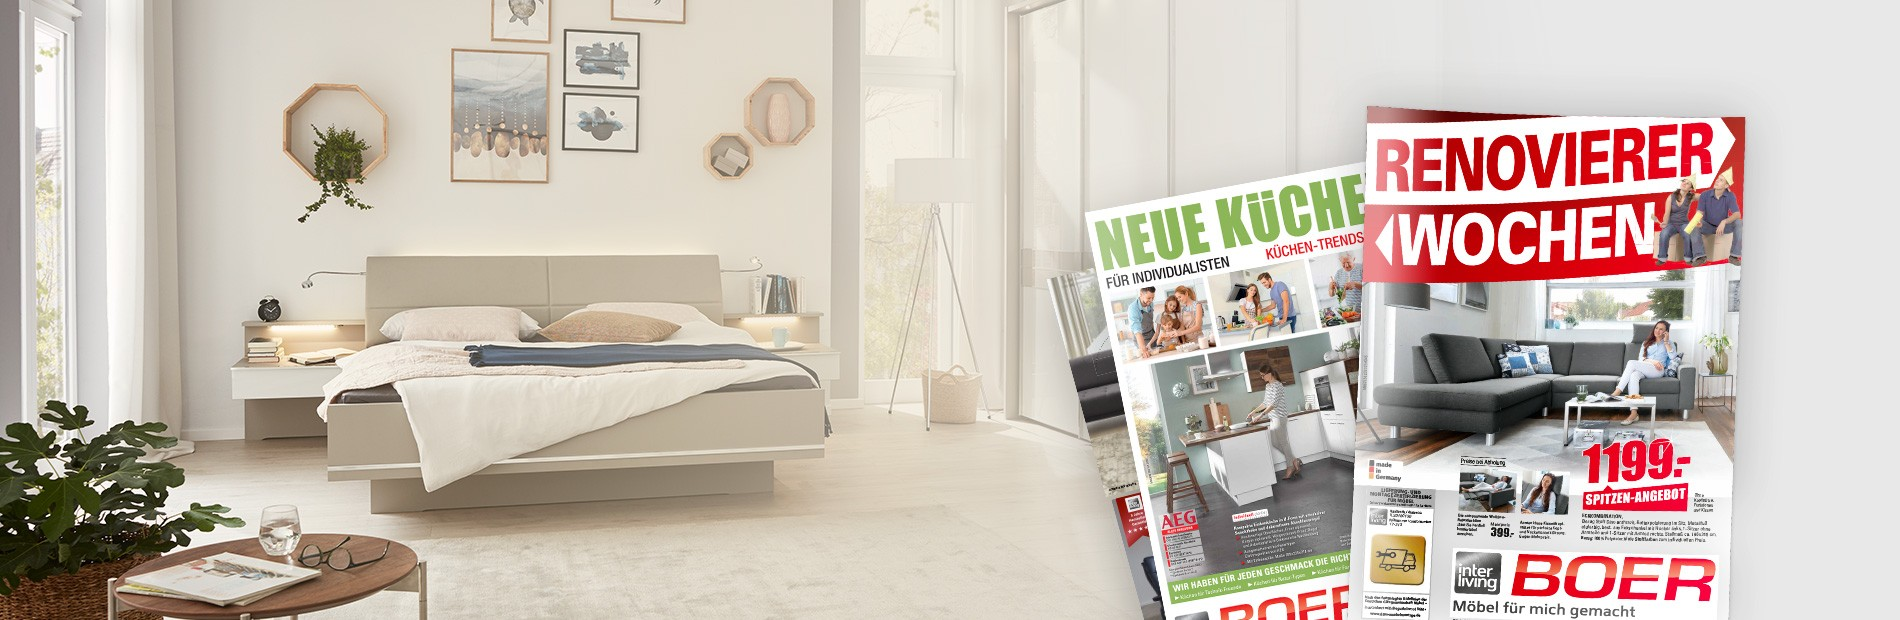 Herzlich Willkommen bei Interliving Möbel Boer in Coesfeld im ...